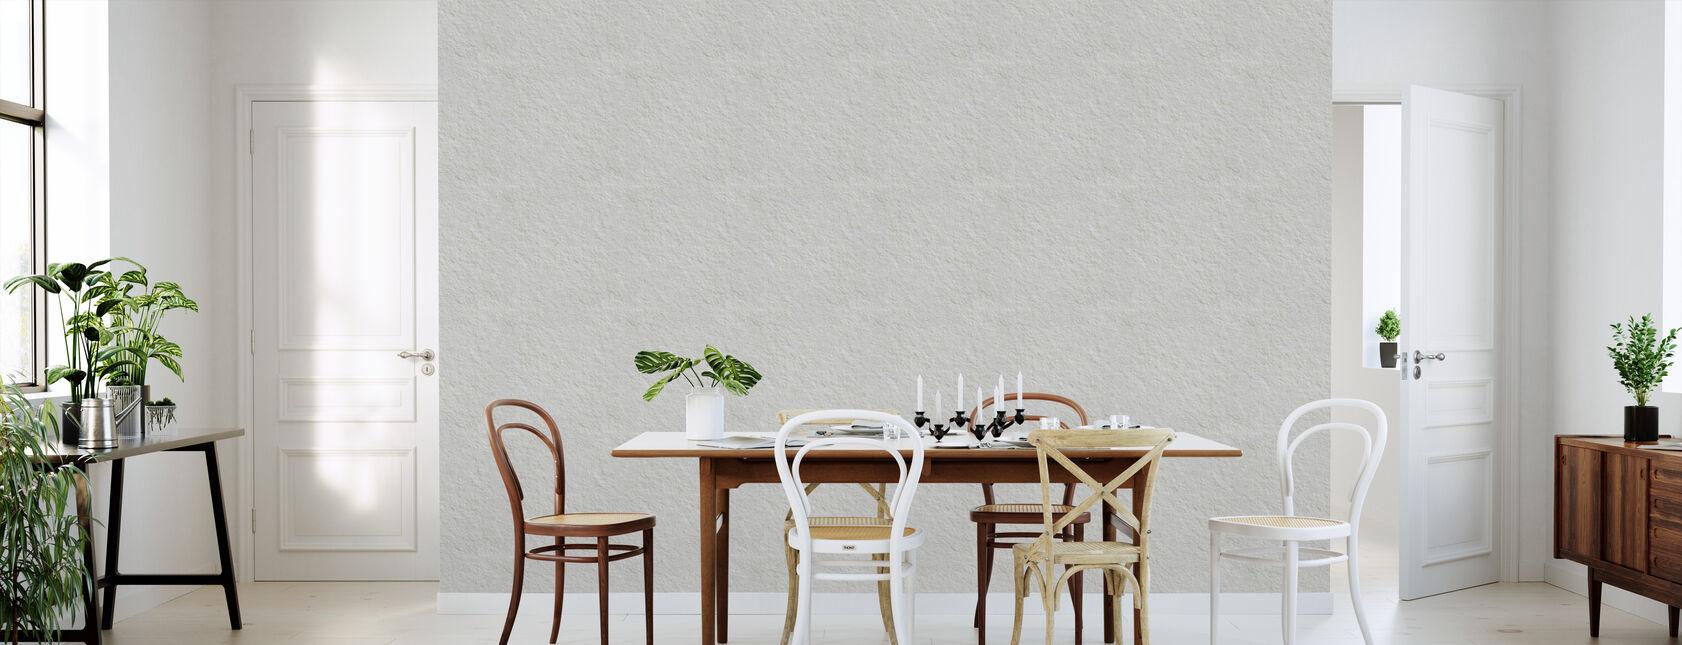 Smoth Stone Texture - Wallpaper - Kitchen